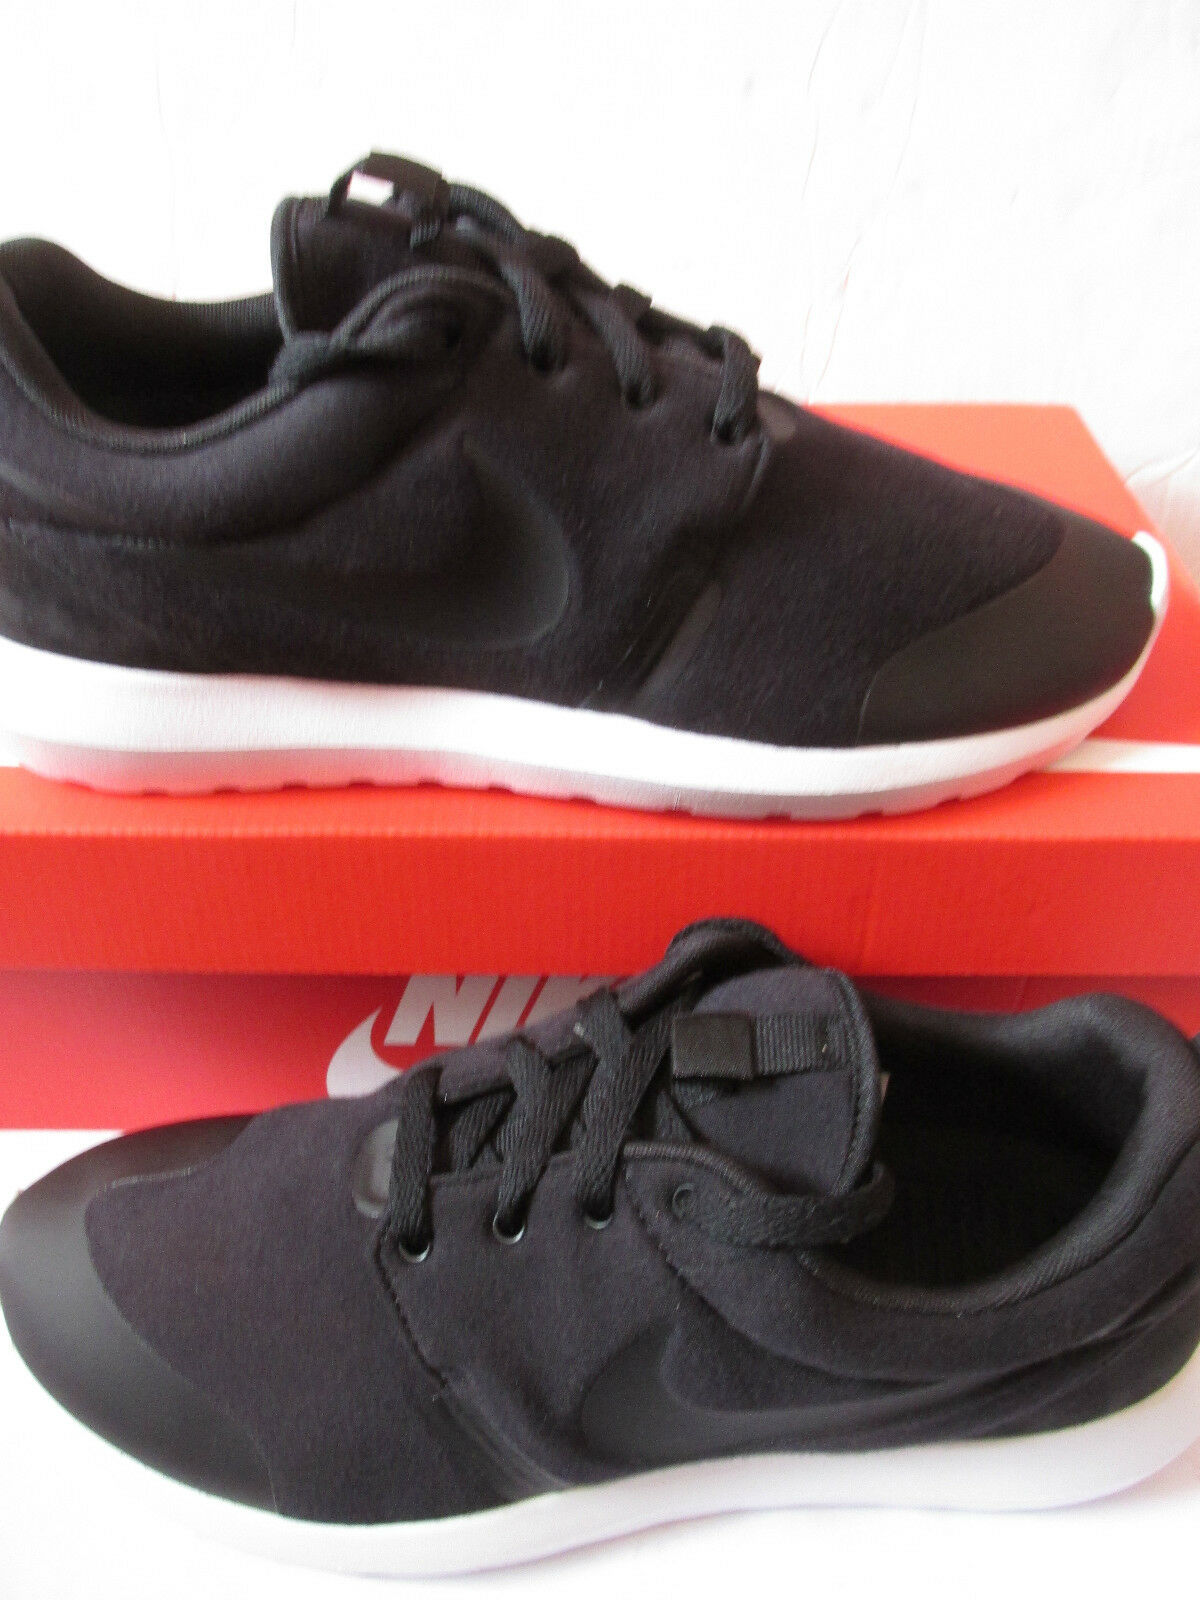 Nike roshe NM TP mens mens mens trainers 749658 001 sneakers shoes 8ca9f5